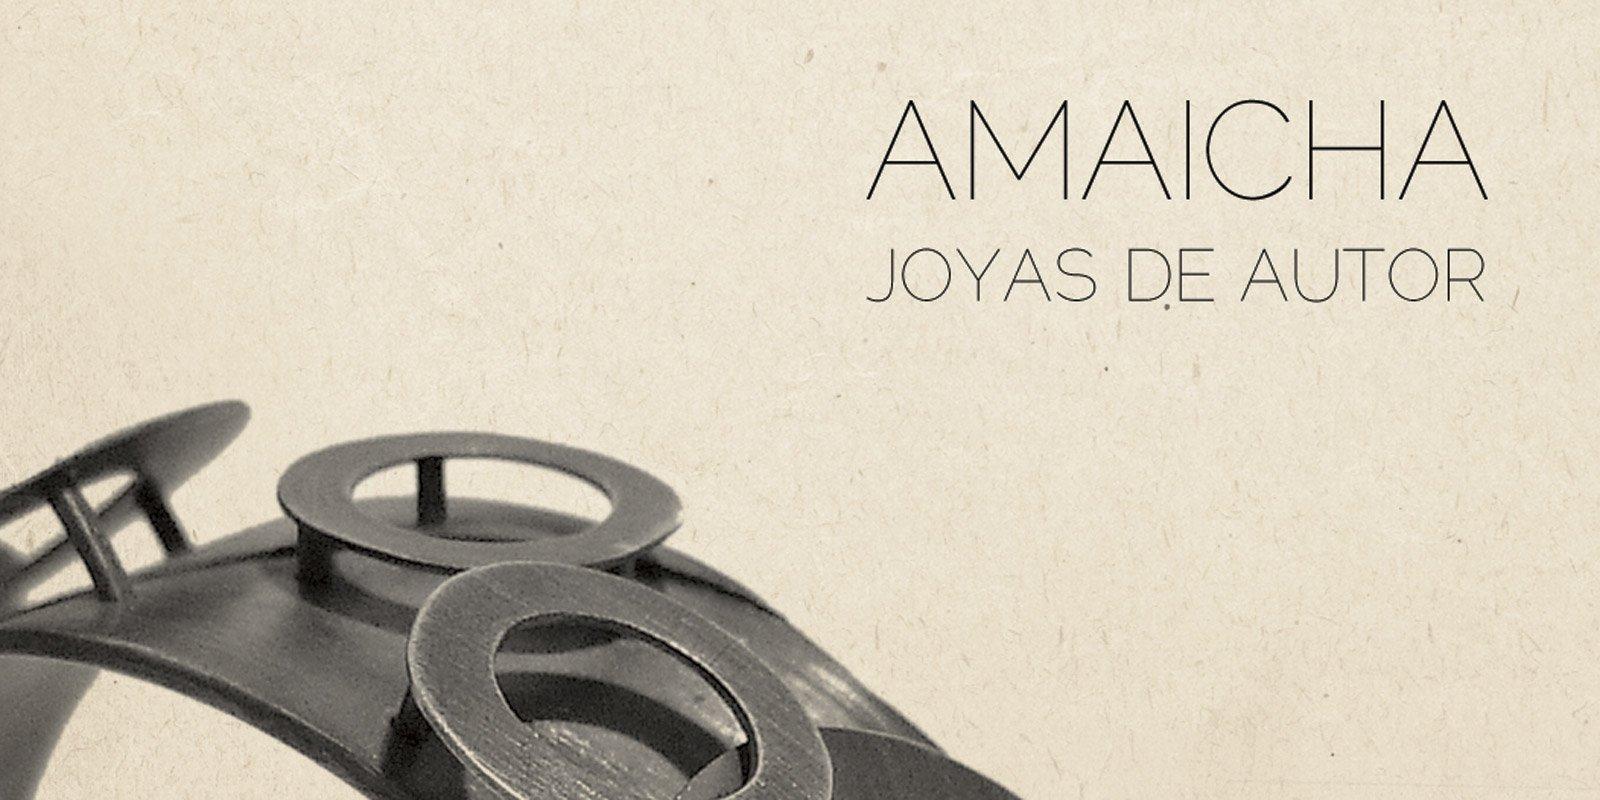 amaicha_joyas